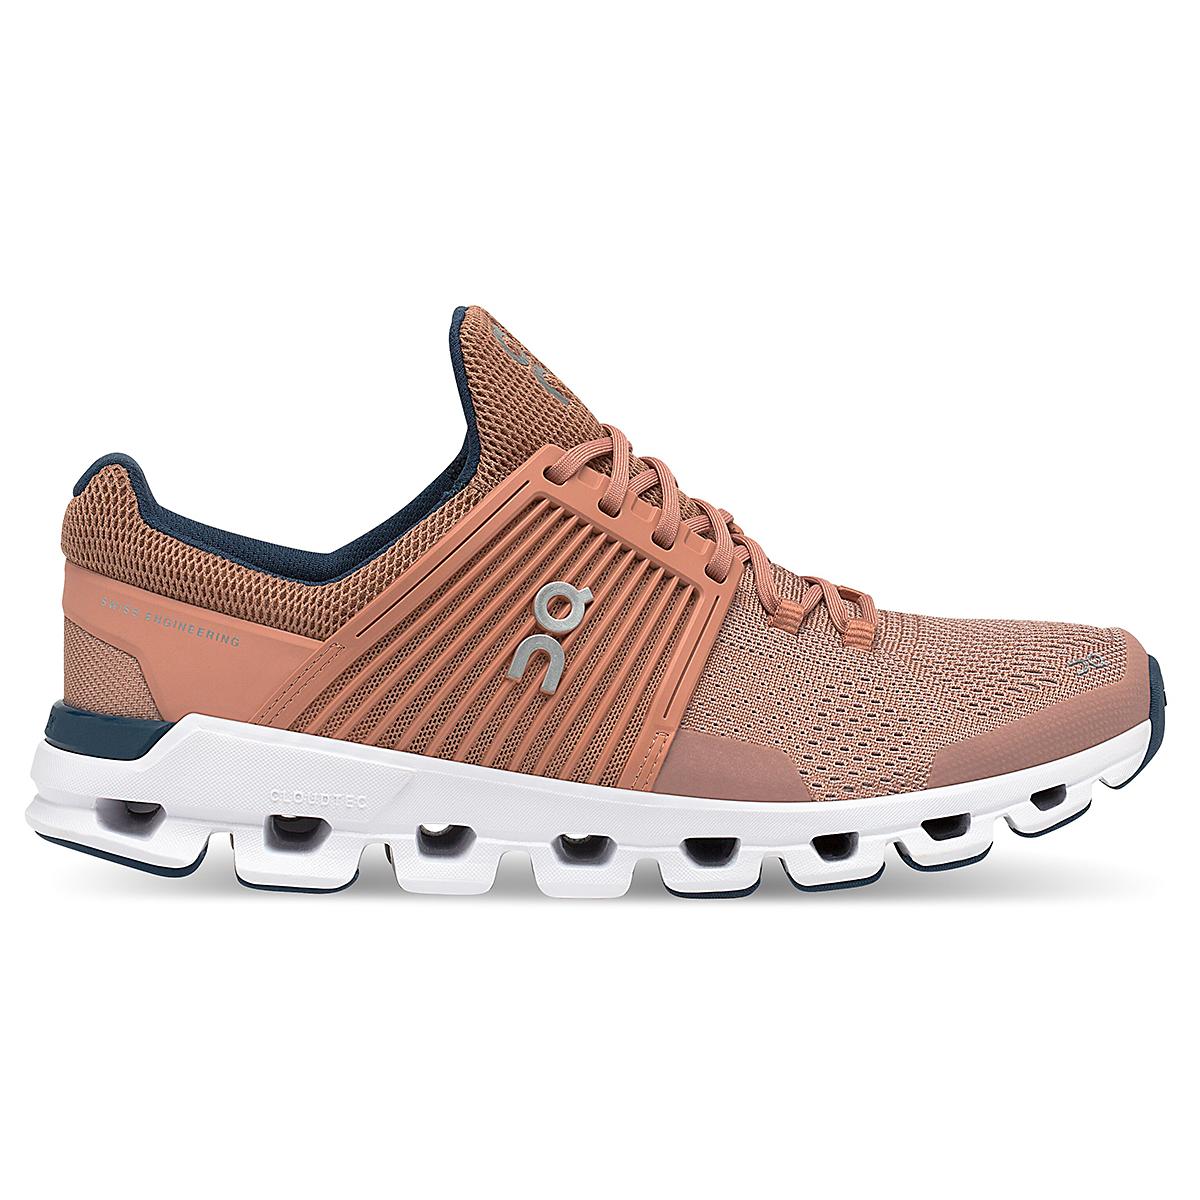 Women's On Cloudswift Running Shoe - Color: Blush/Denim - Size: 6 - Width: Regular, Blush/Denim, large, image 1